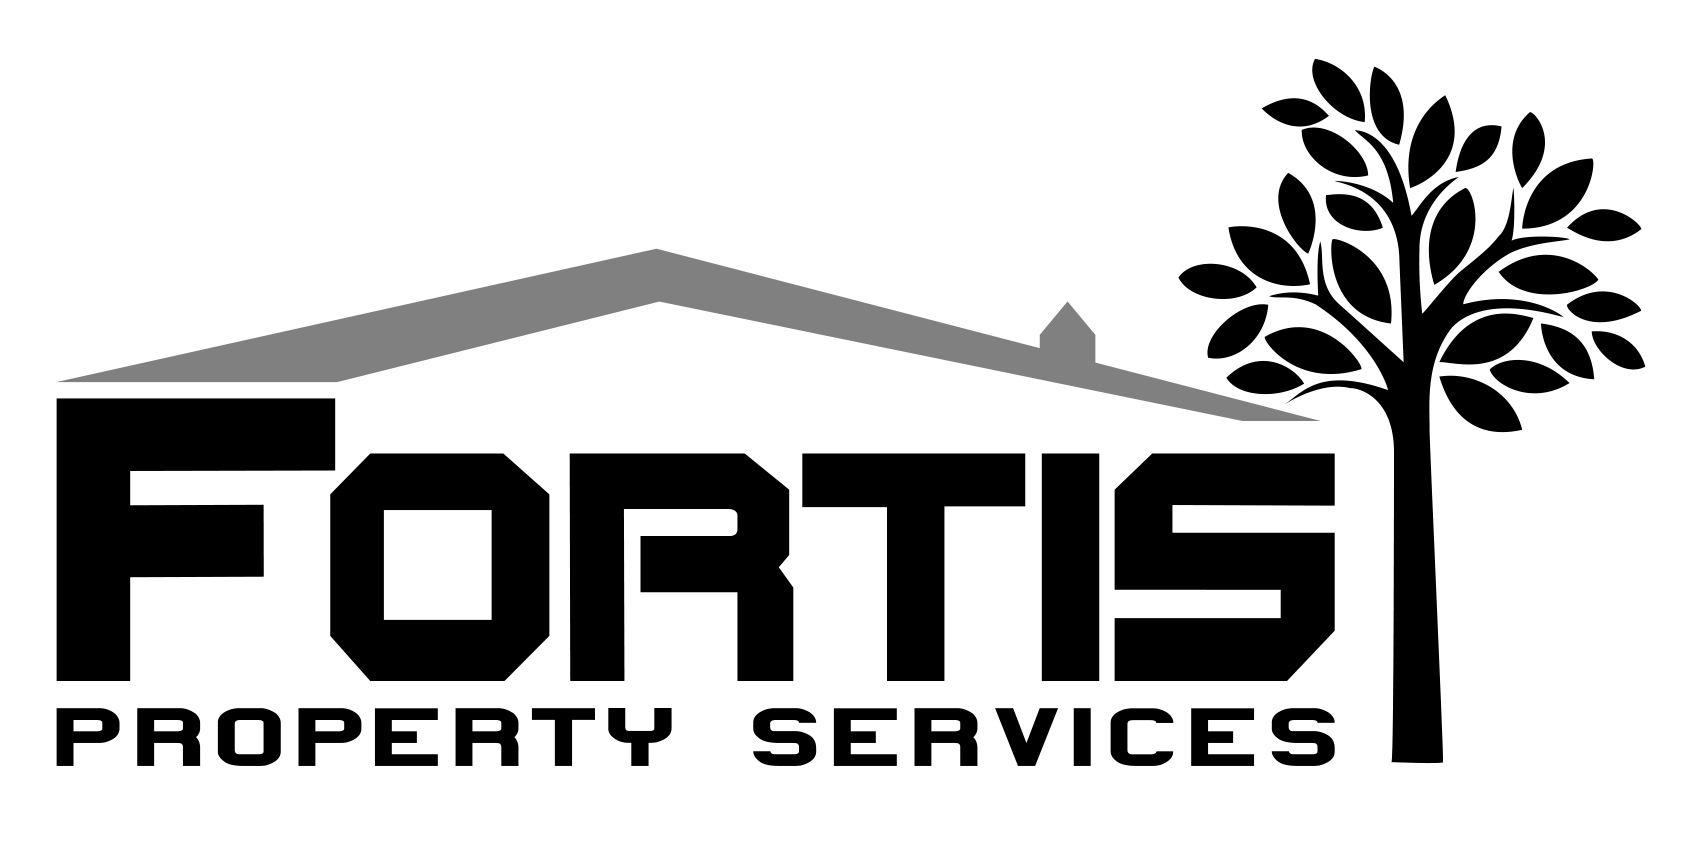 Fortis Property Services logo Black & White